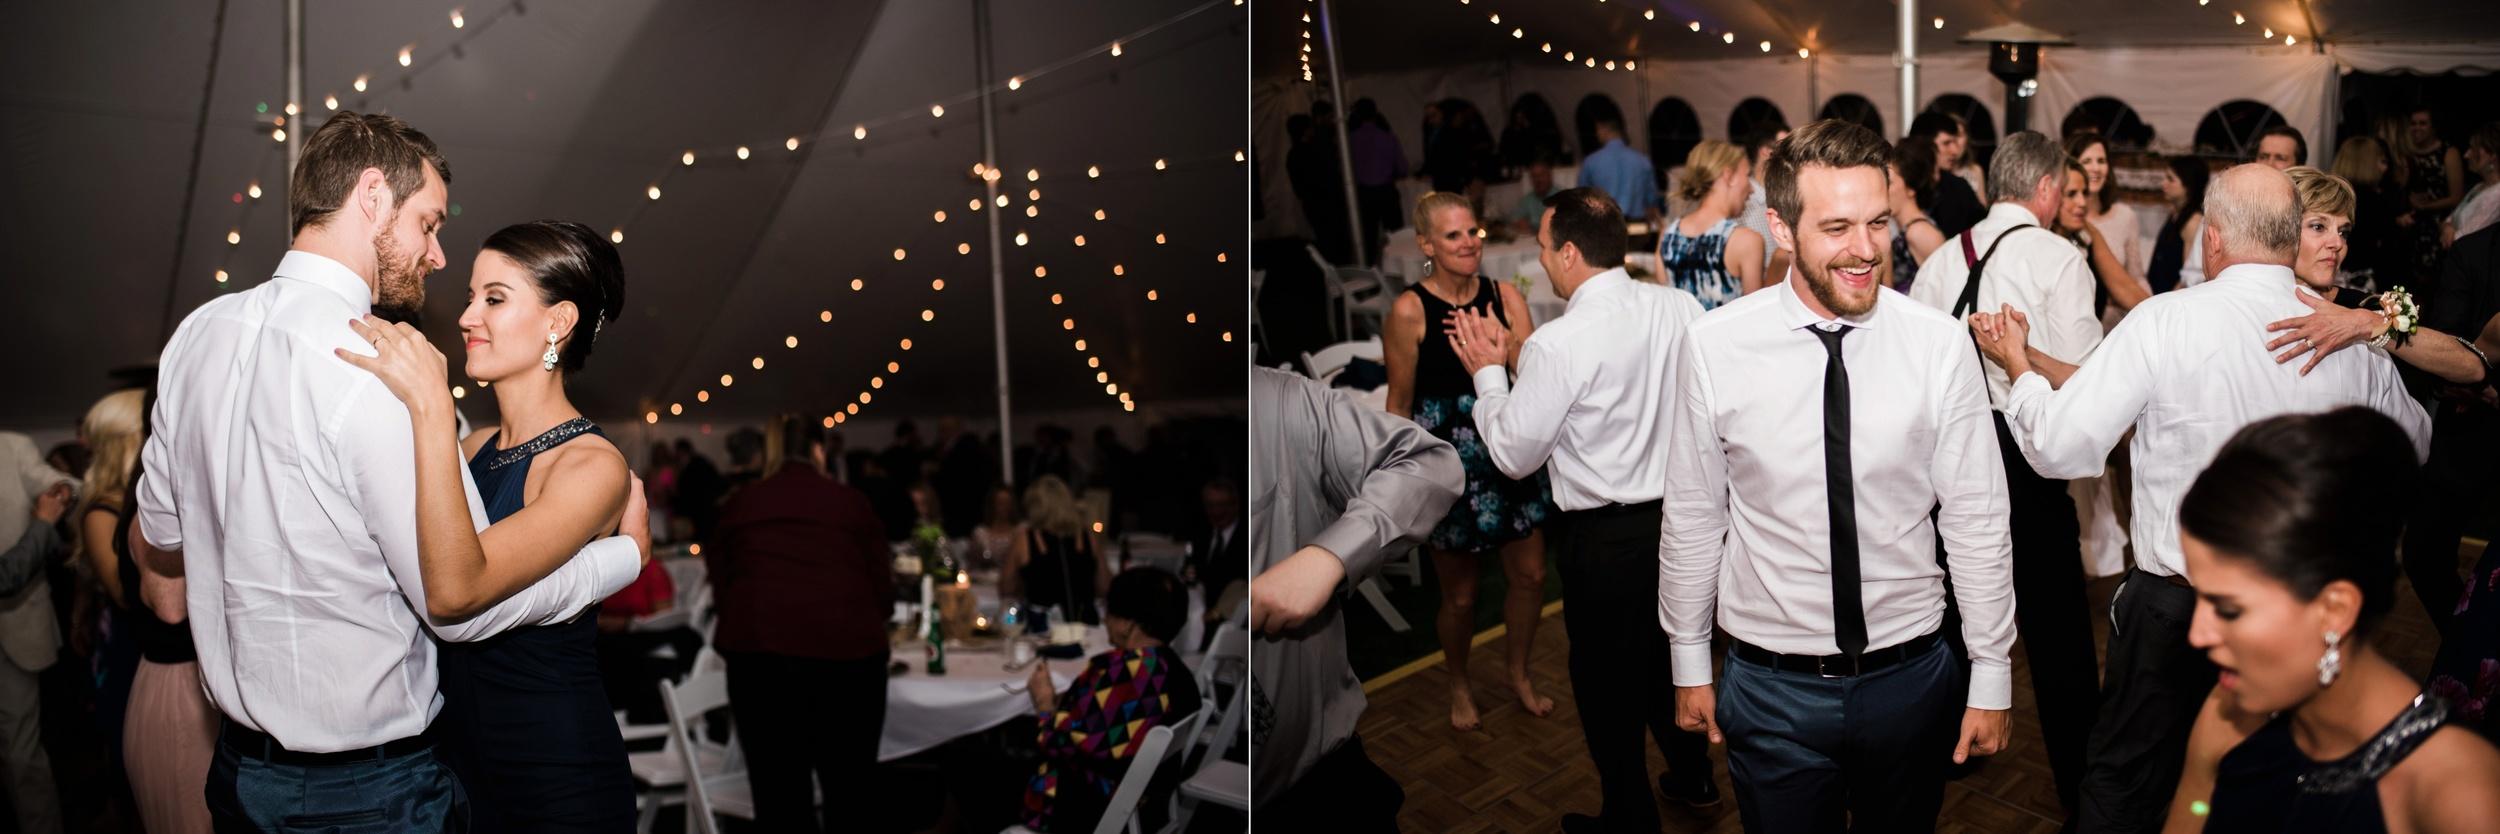 Burlington Golf Club Wedding Photographer Ali Leigh Photo_2425.jpg